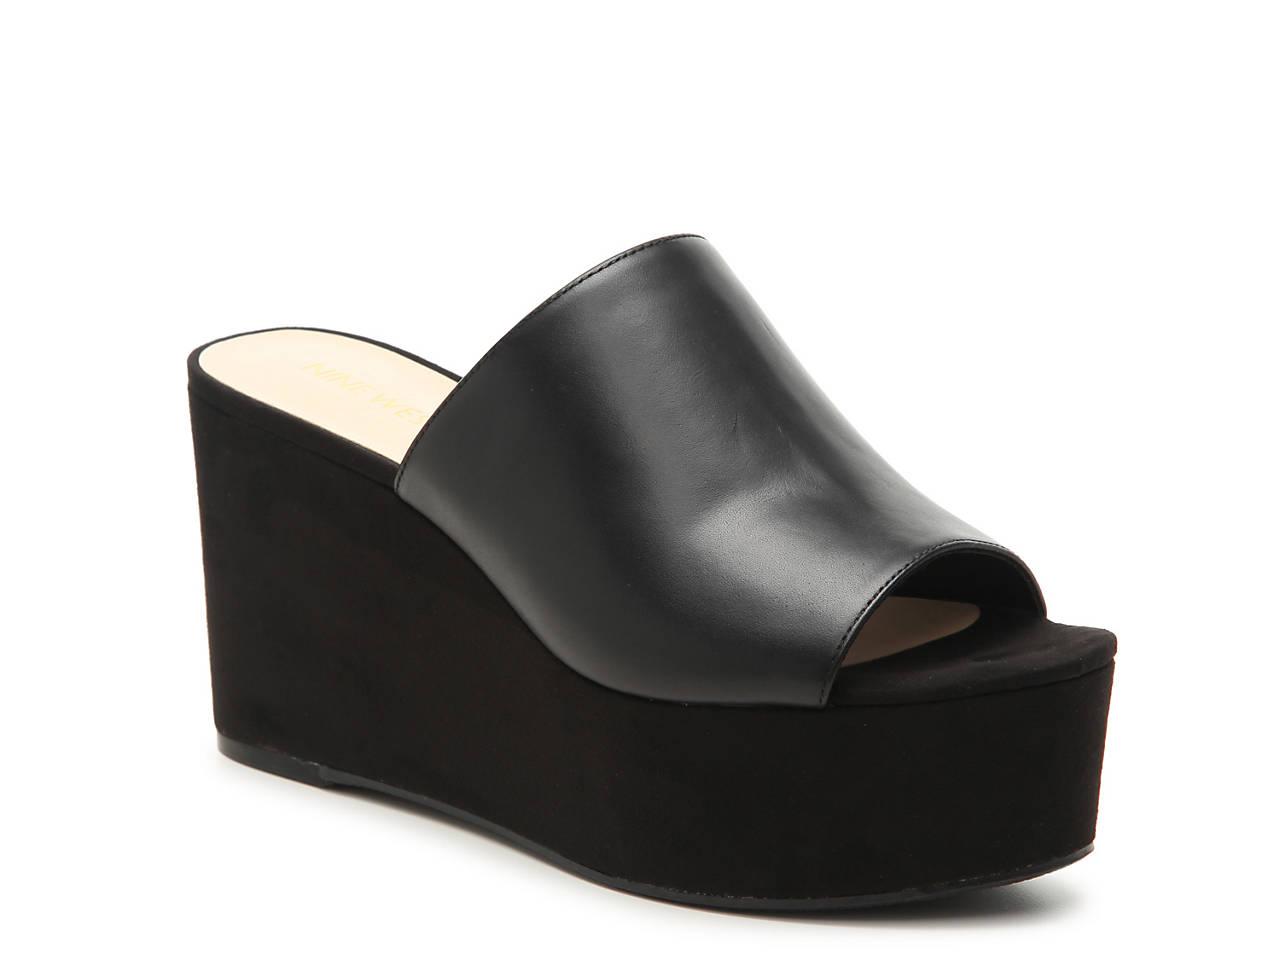 b5fbe296b096 Nine West Kelsawn Wedge Sandal Women s Shoes